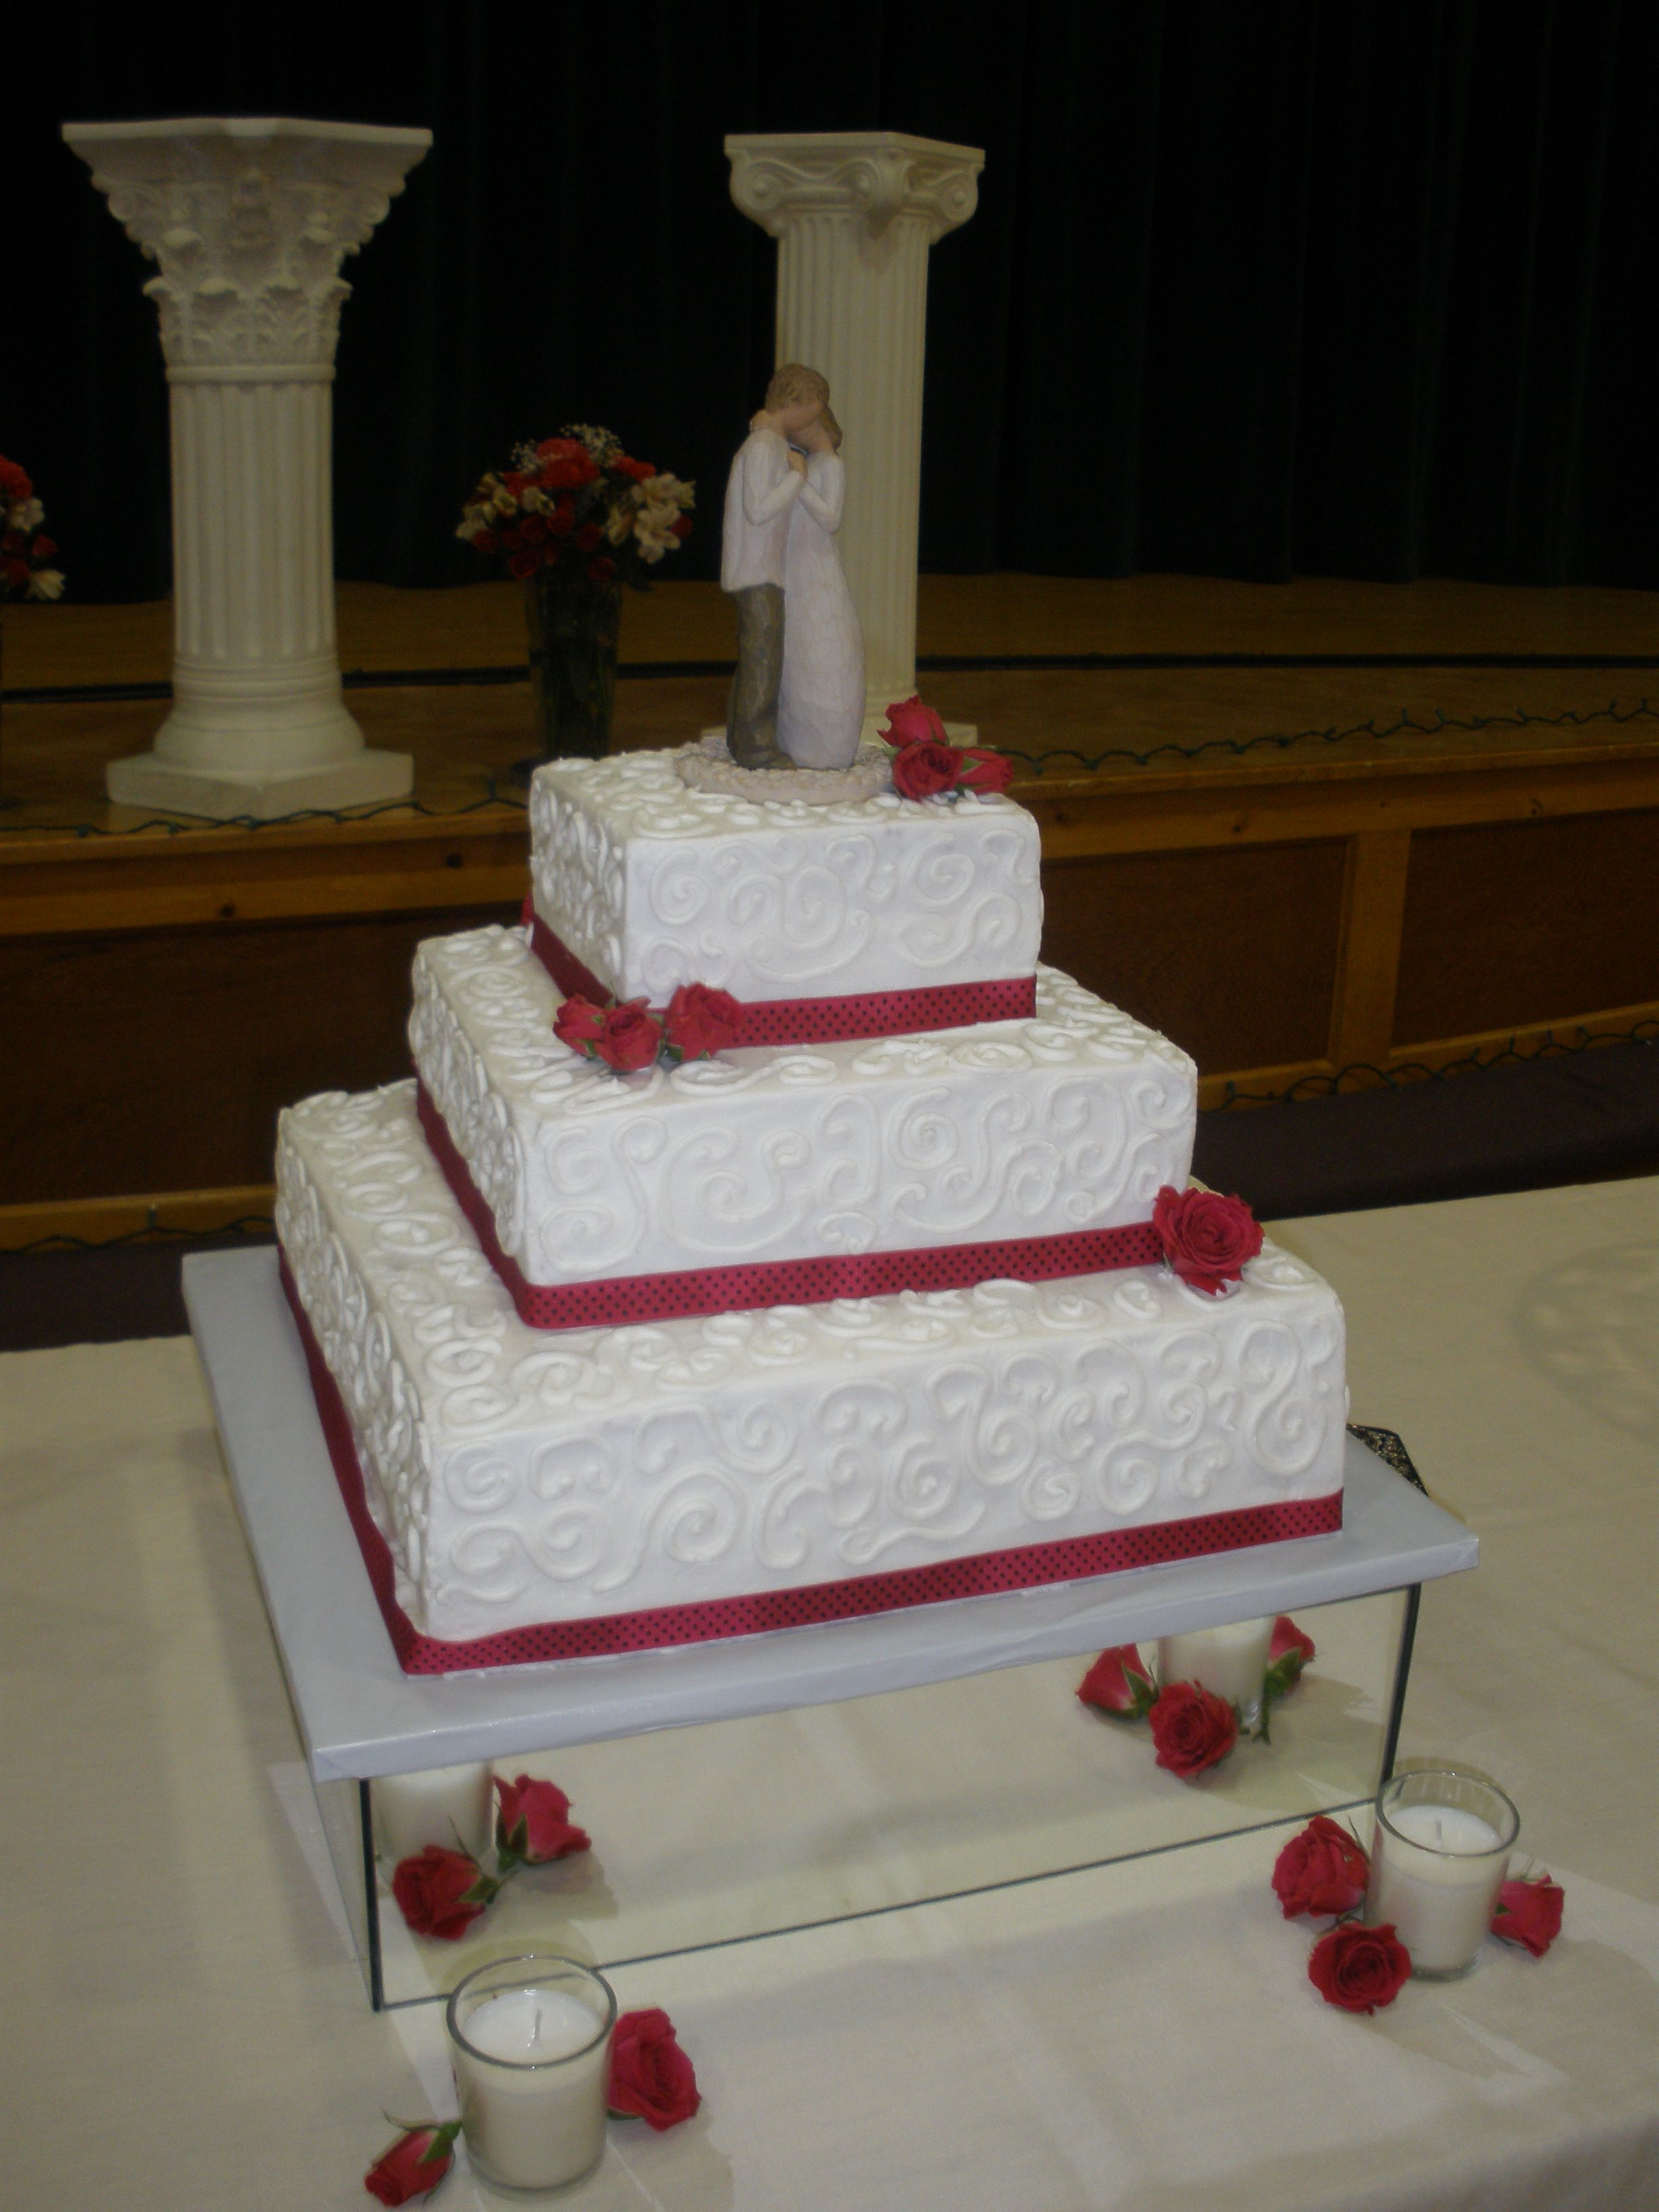 Similiar 3 Tier Square Wedding Cakes Keywords